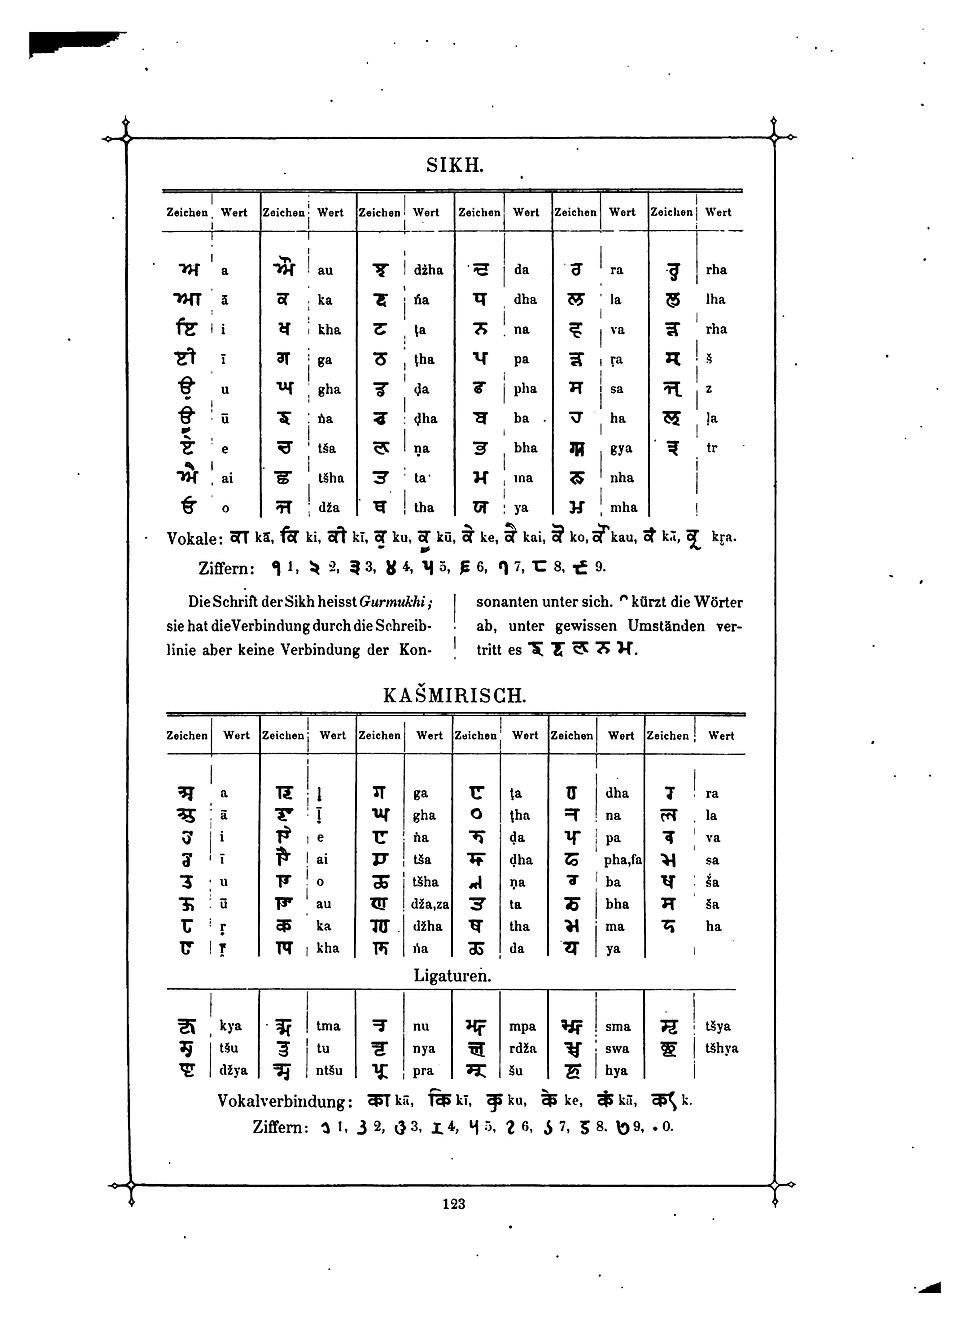 Das Buch der Schrift (Faulmann) 138